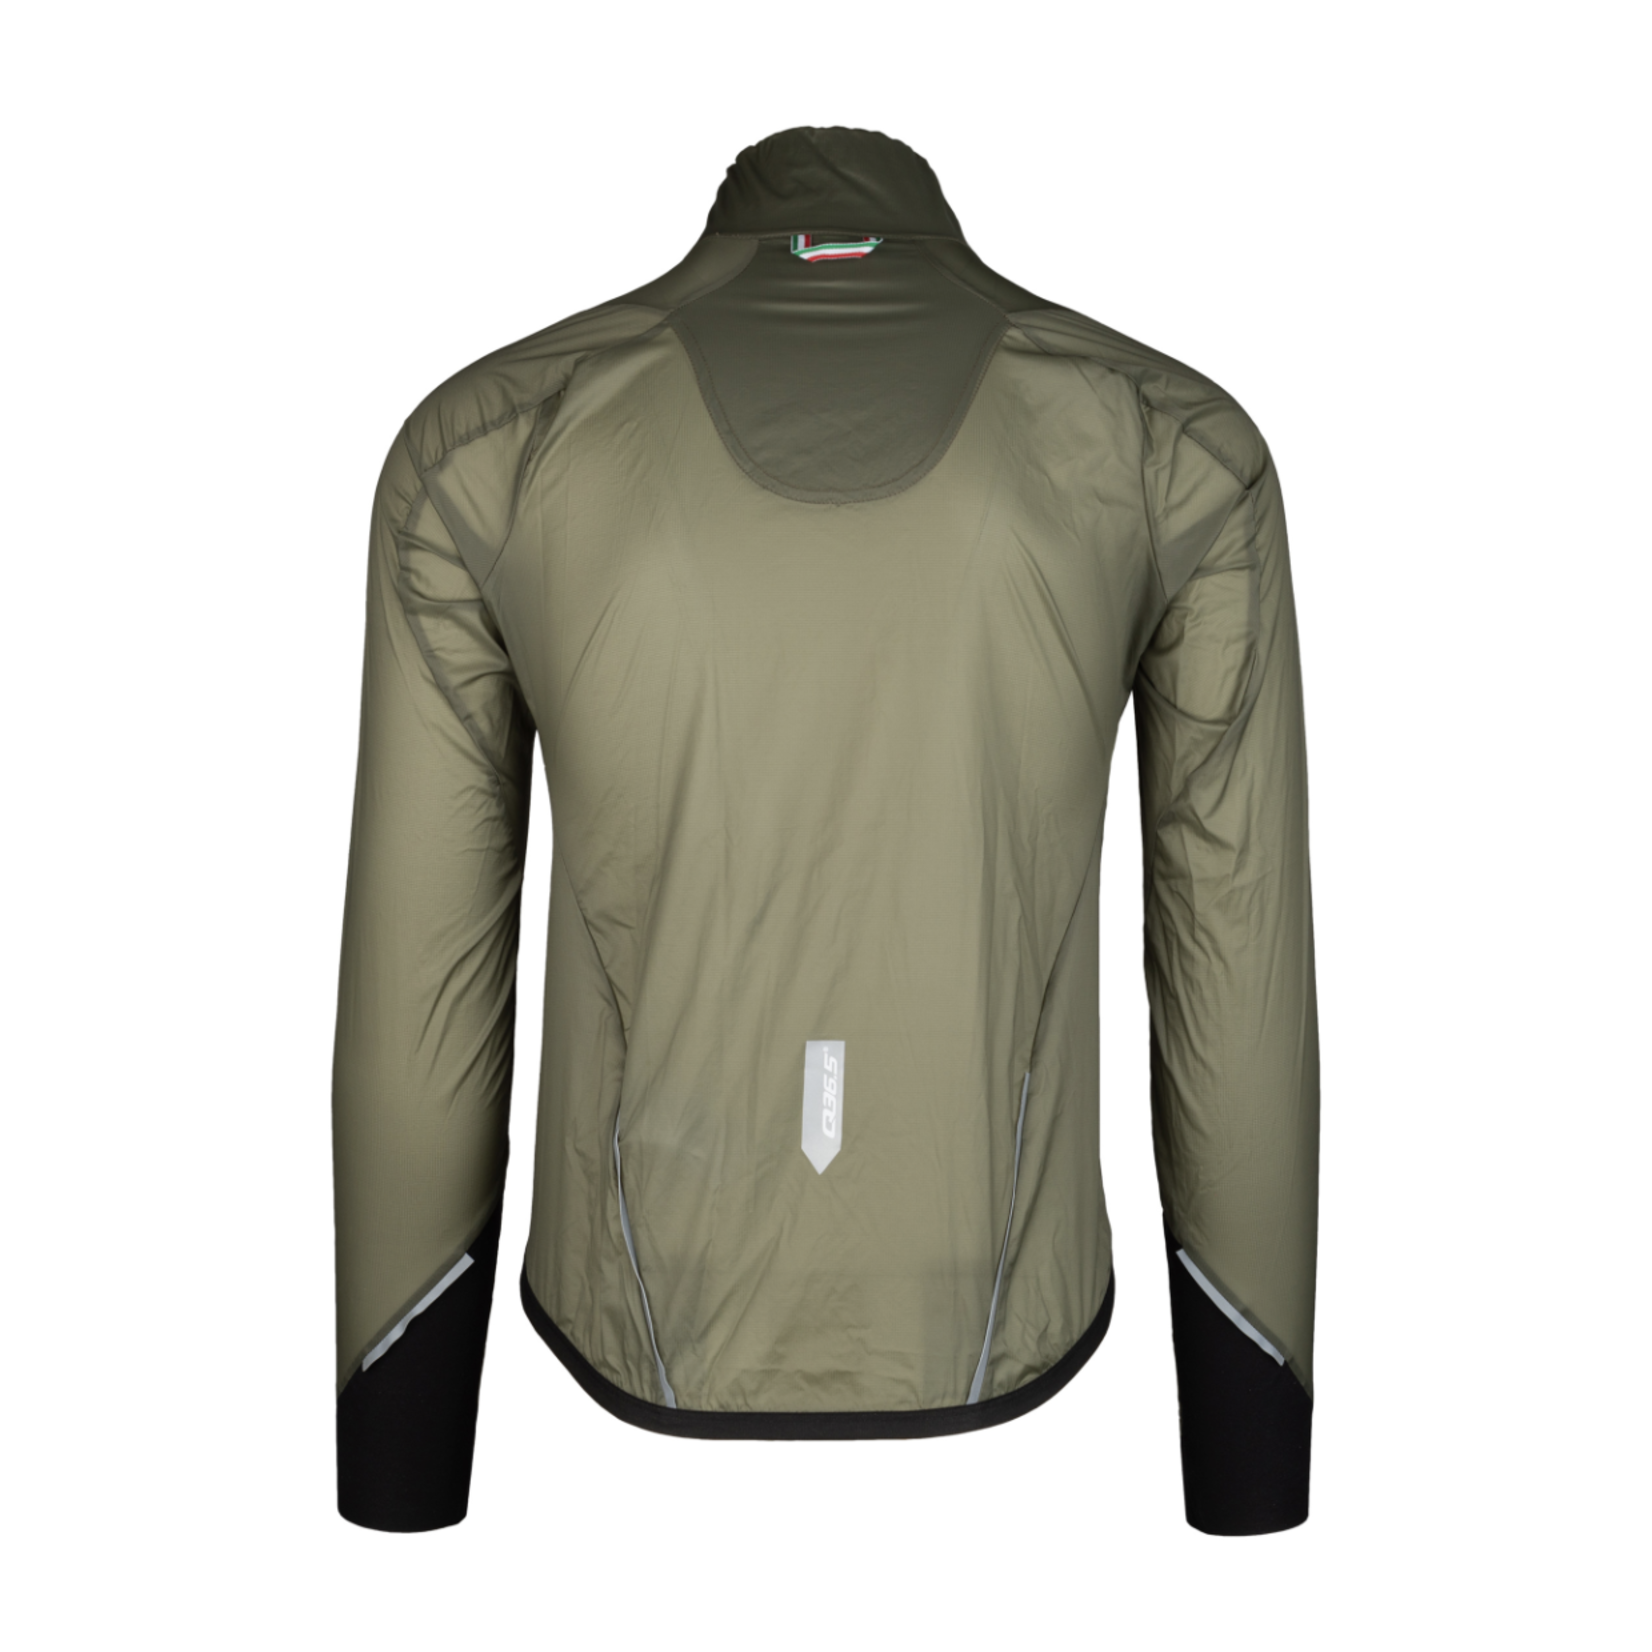 Q36.5 Q36.5 Air Shell Wind-Jacket - Olive Green